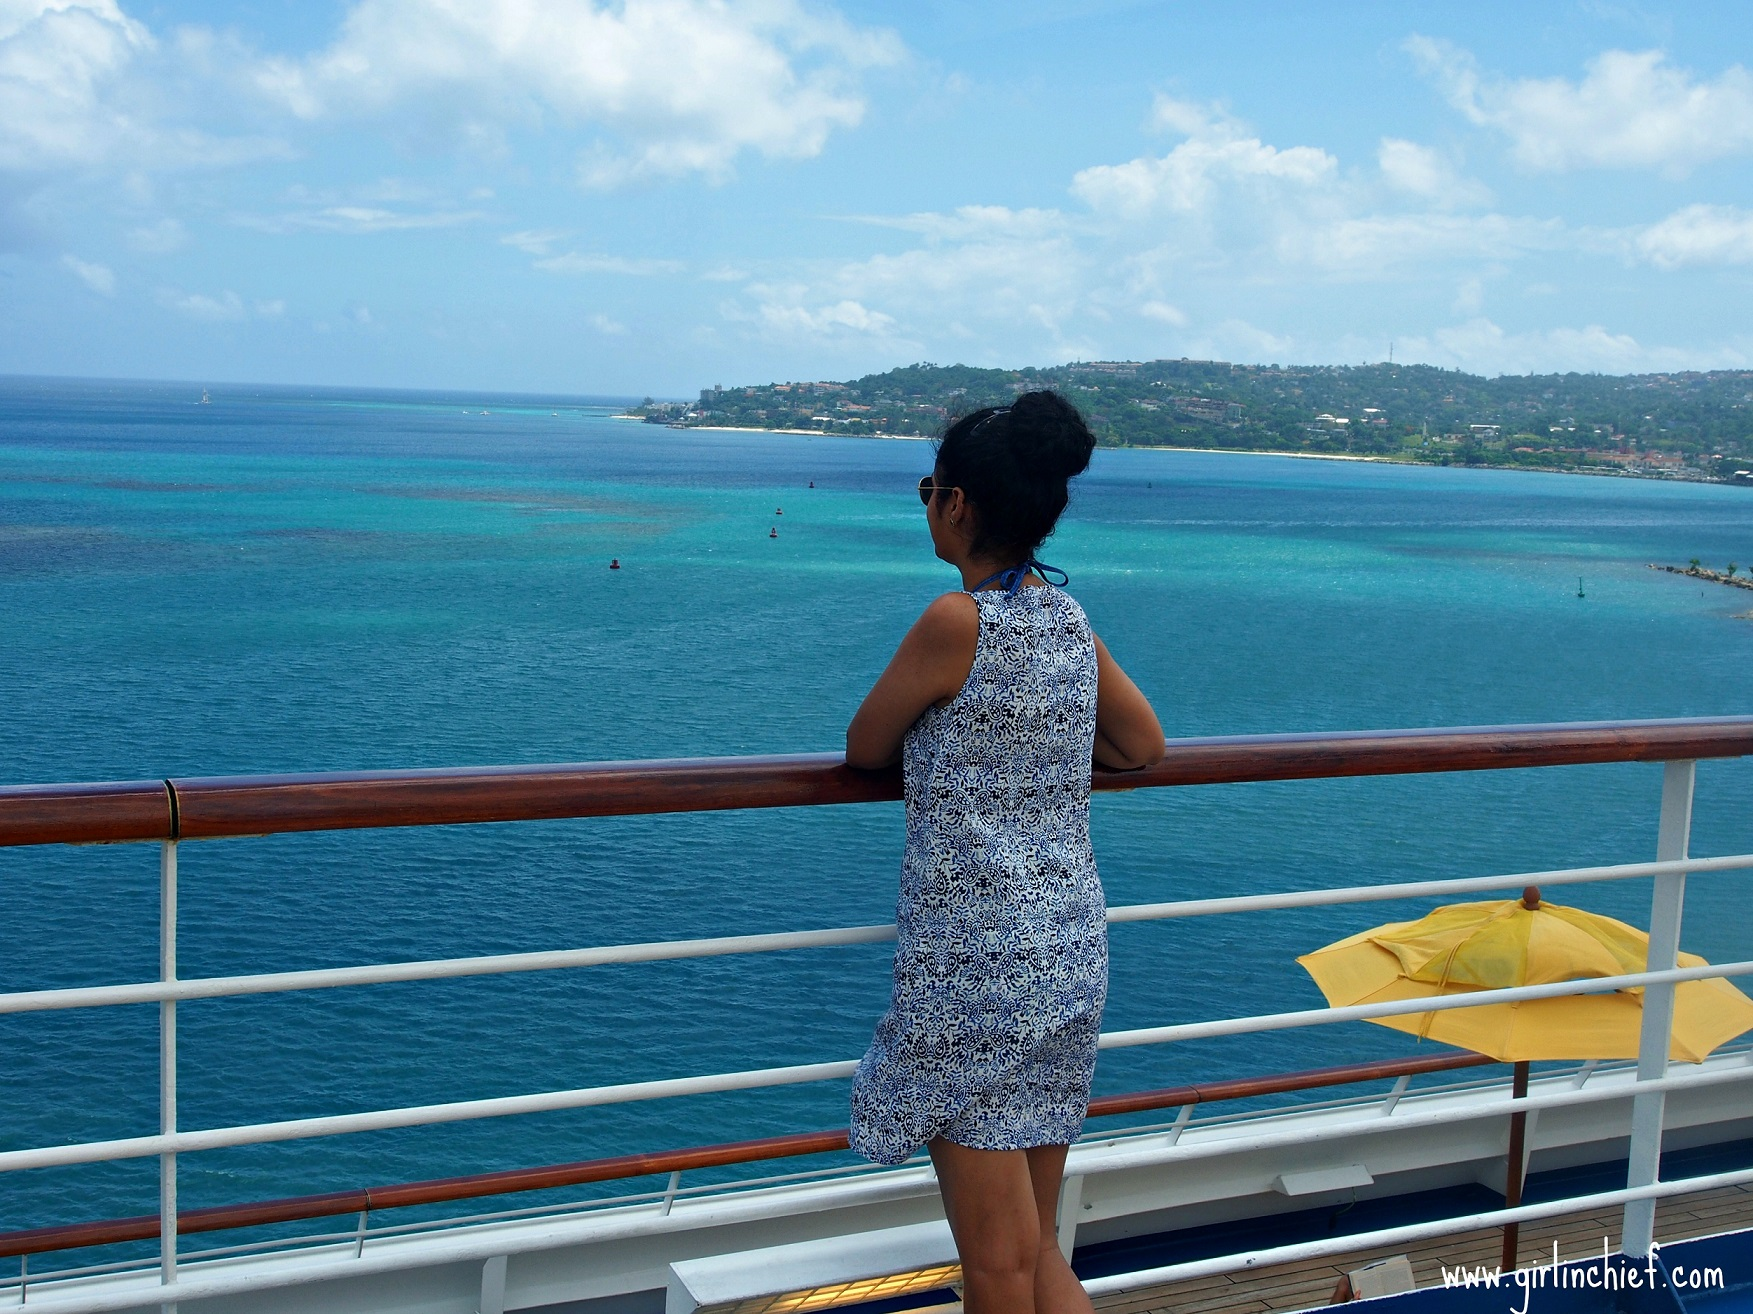 montego-bay-jamaica-carnival-freedom